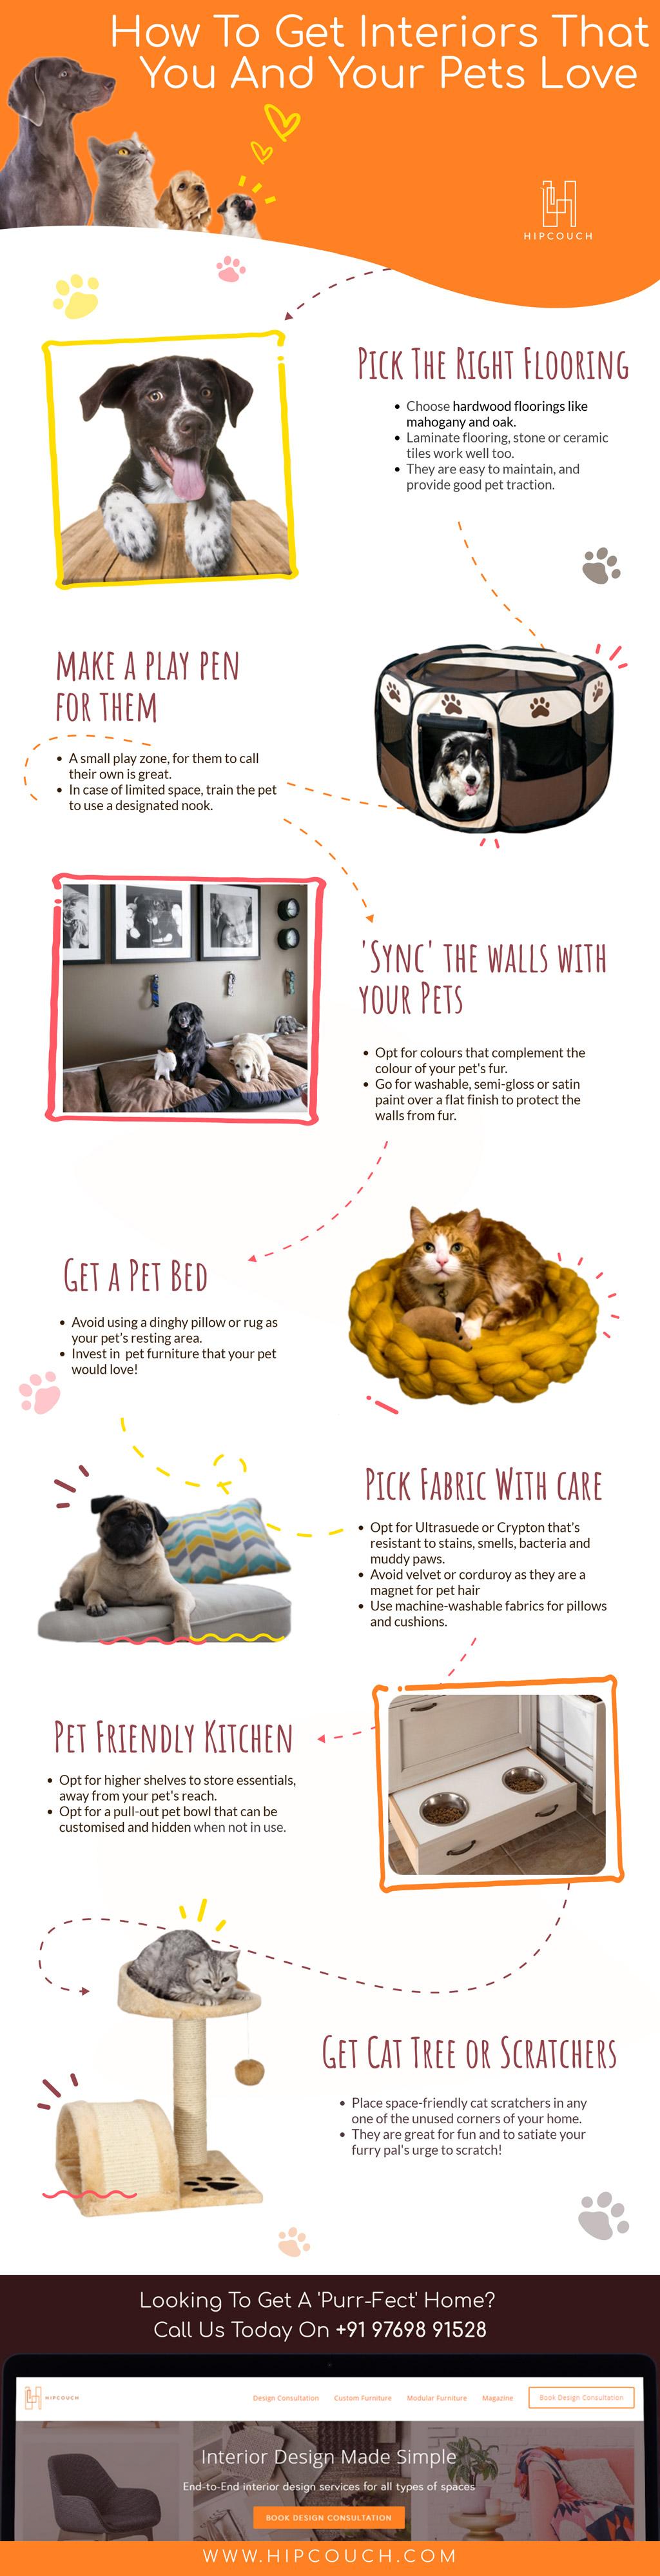 interiors-designs-for-pet-lovers.jpg